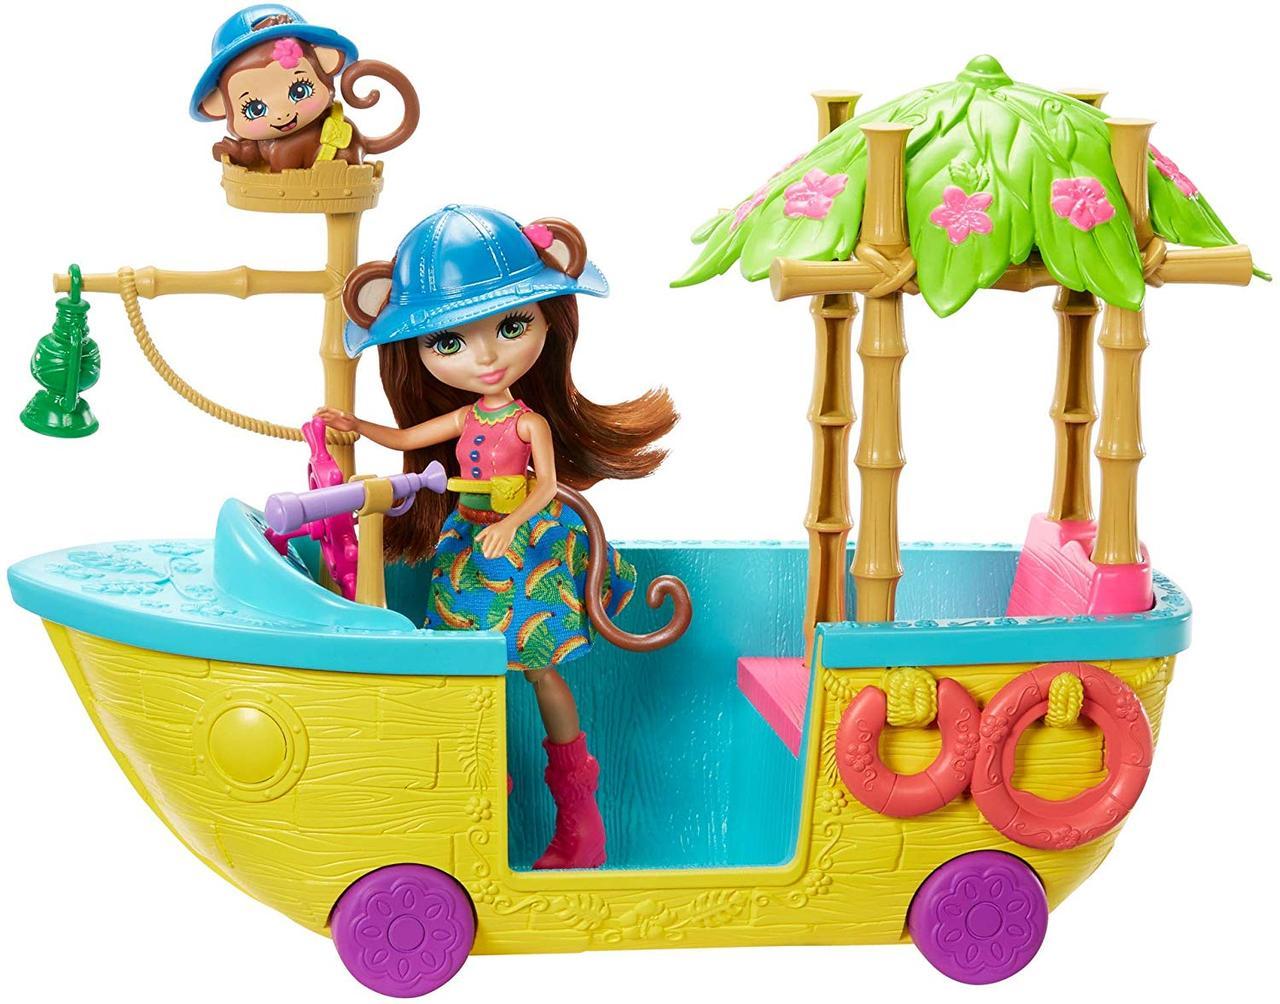 Энчантималс лодка обезьянки Мерит и питомца Компасом Enchantimals Junglewood Boat & Merit Monkey Doll